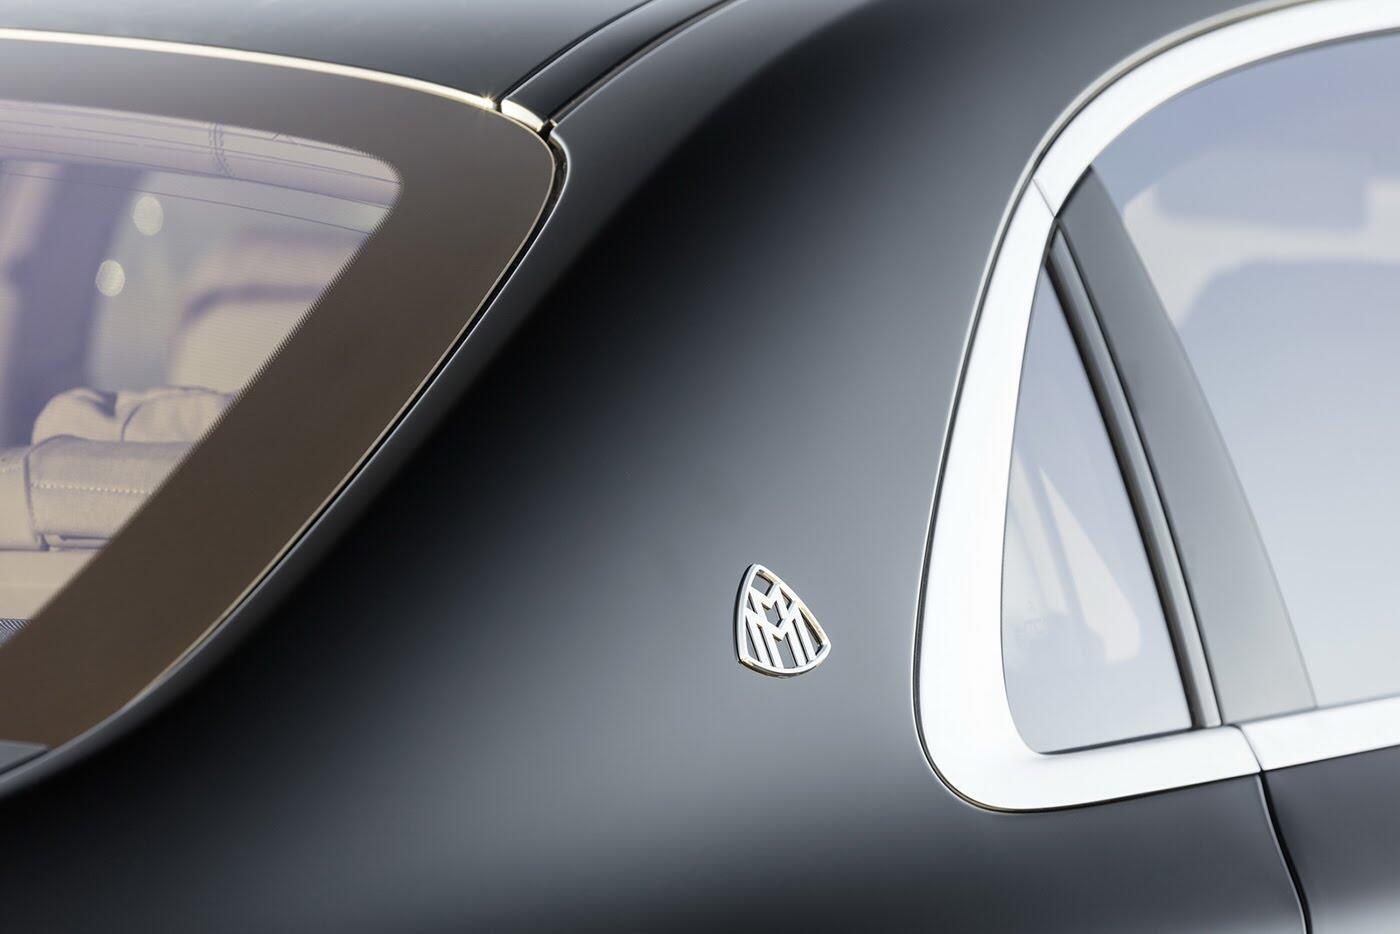 Ảnh chi tiết Mercedes-Benz S-Class 2018 - Hình 13